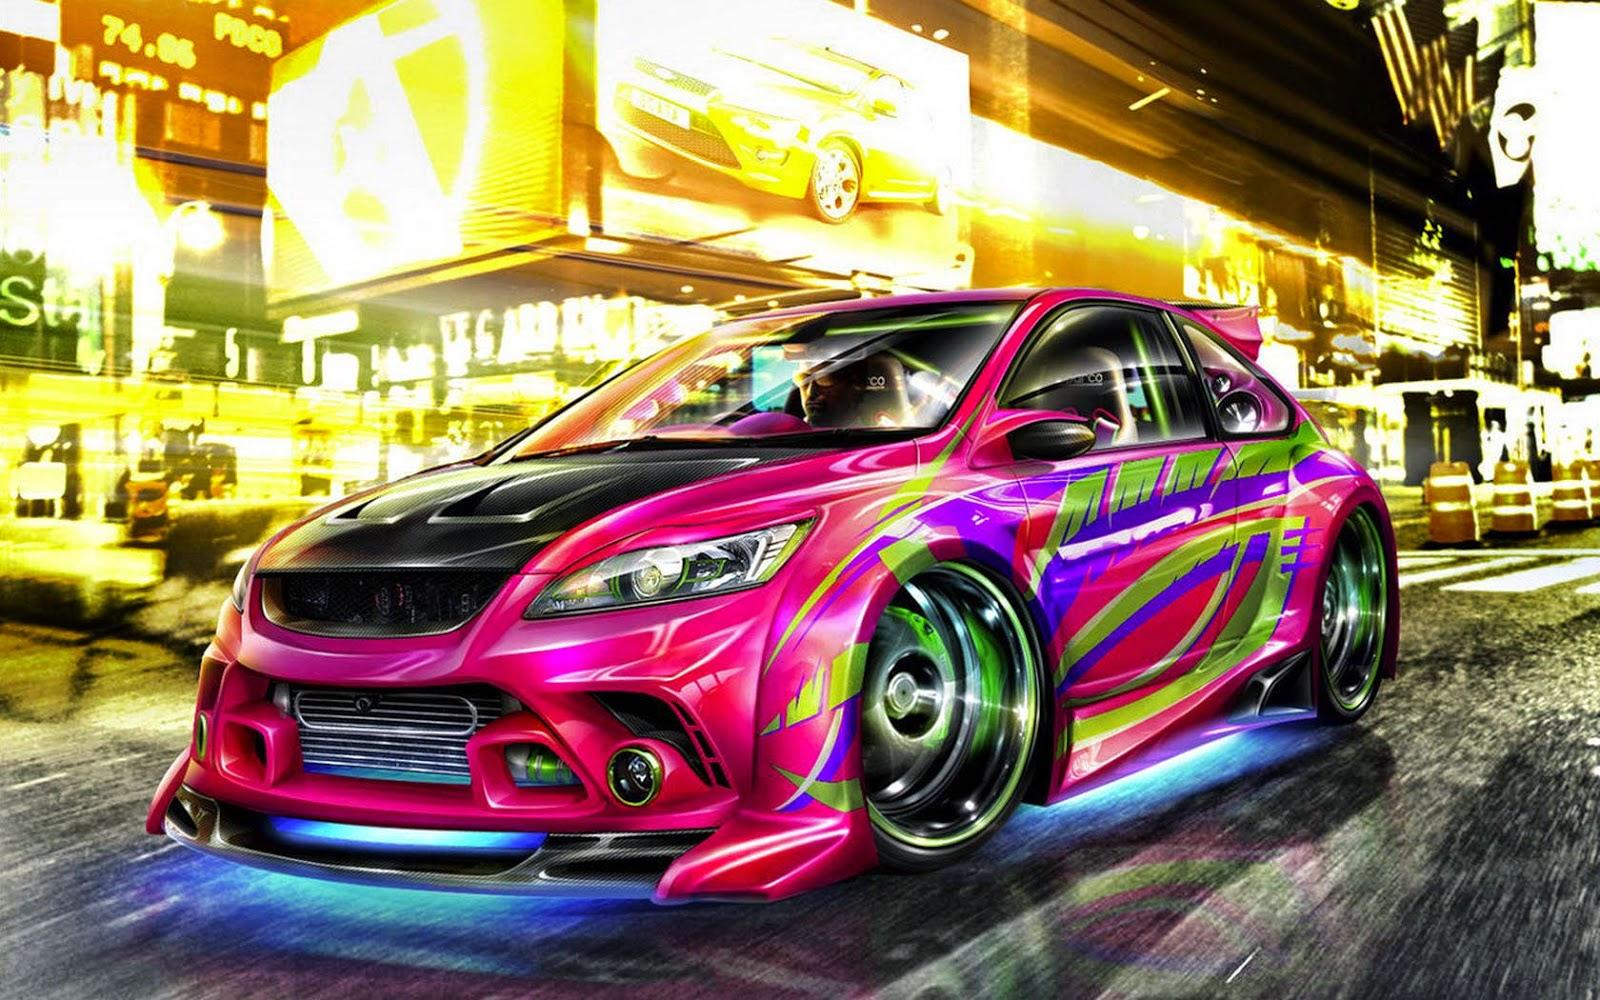 Papel de Parede Carro Tunado com Neon sports car wallpaper image hd free